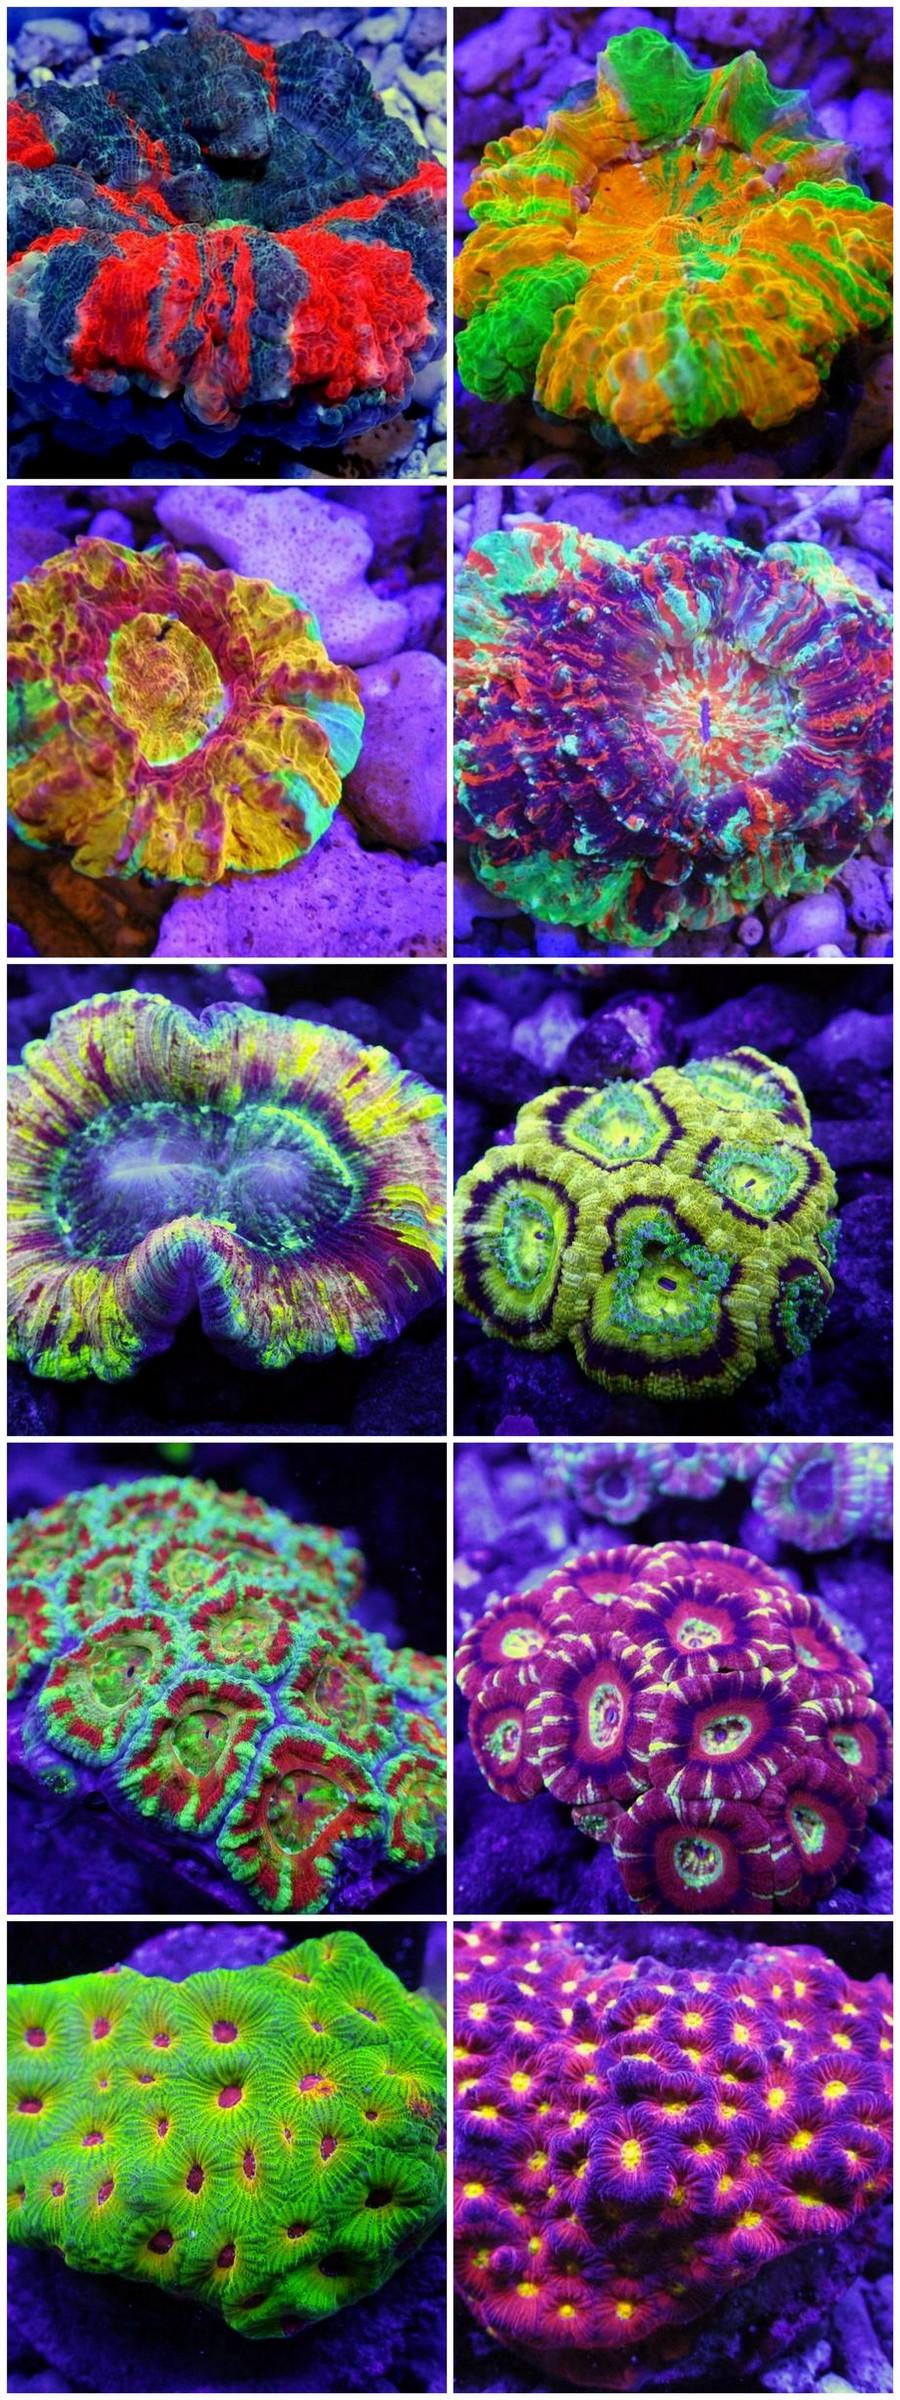 coral reef,coral,stony coral,marine biology,reef